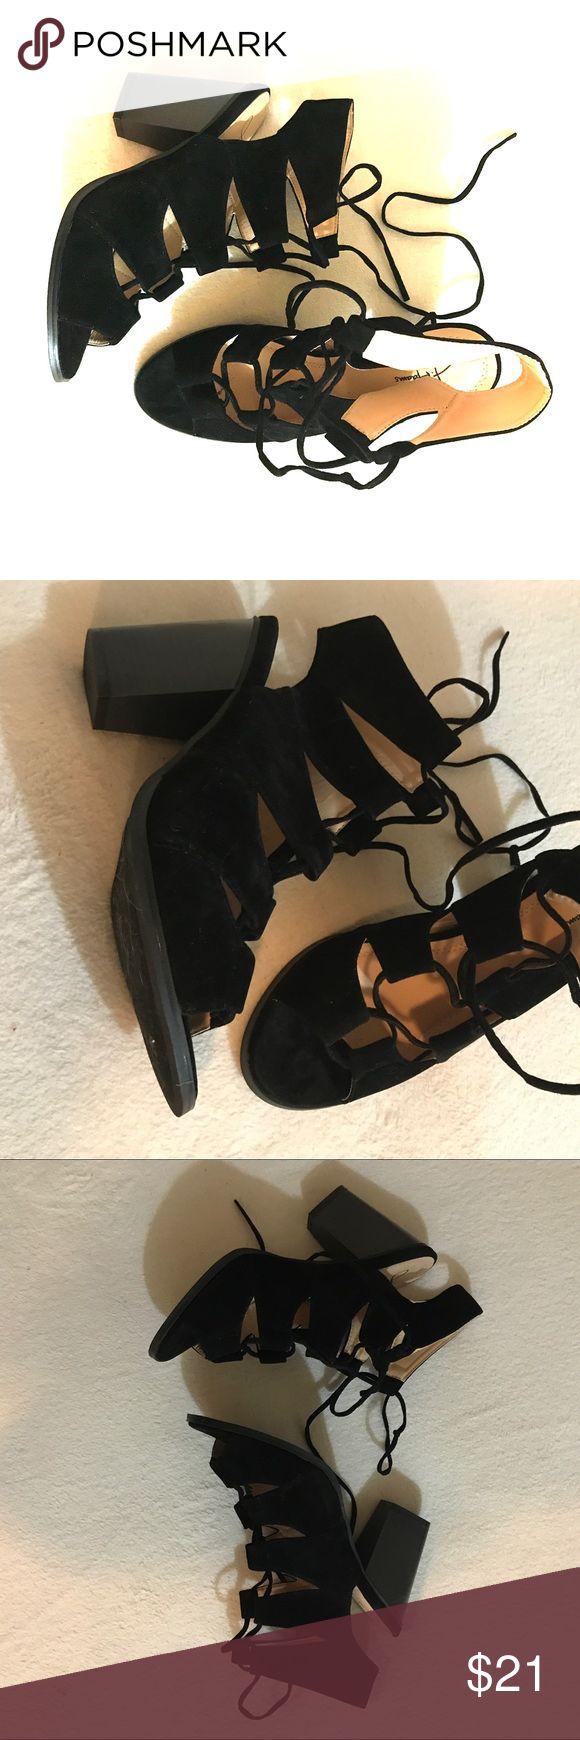 J Adams Katana new cage Lace up Block heels 8 NEW Brand new and never worn. Black j adams katana black suede heels. Super comfortable, just not my style. 8 j adams Shoes Heels